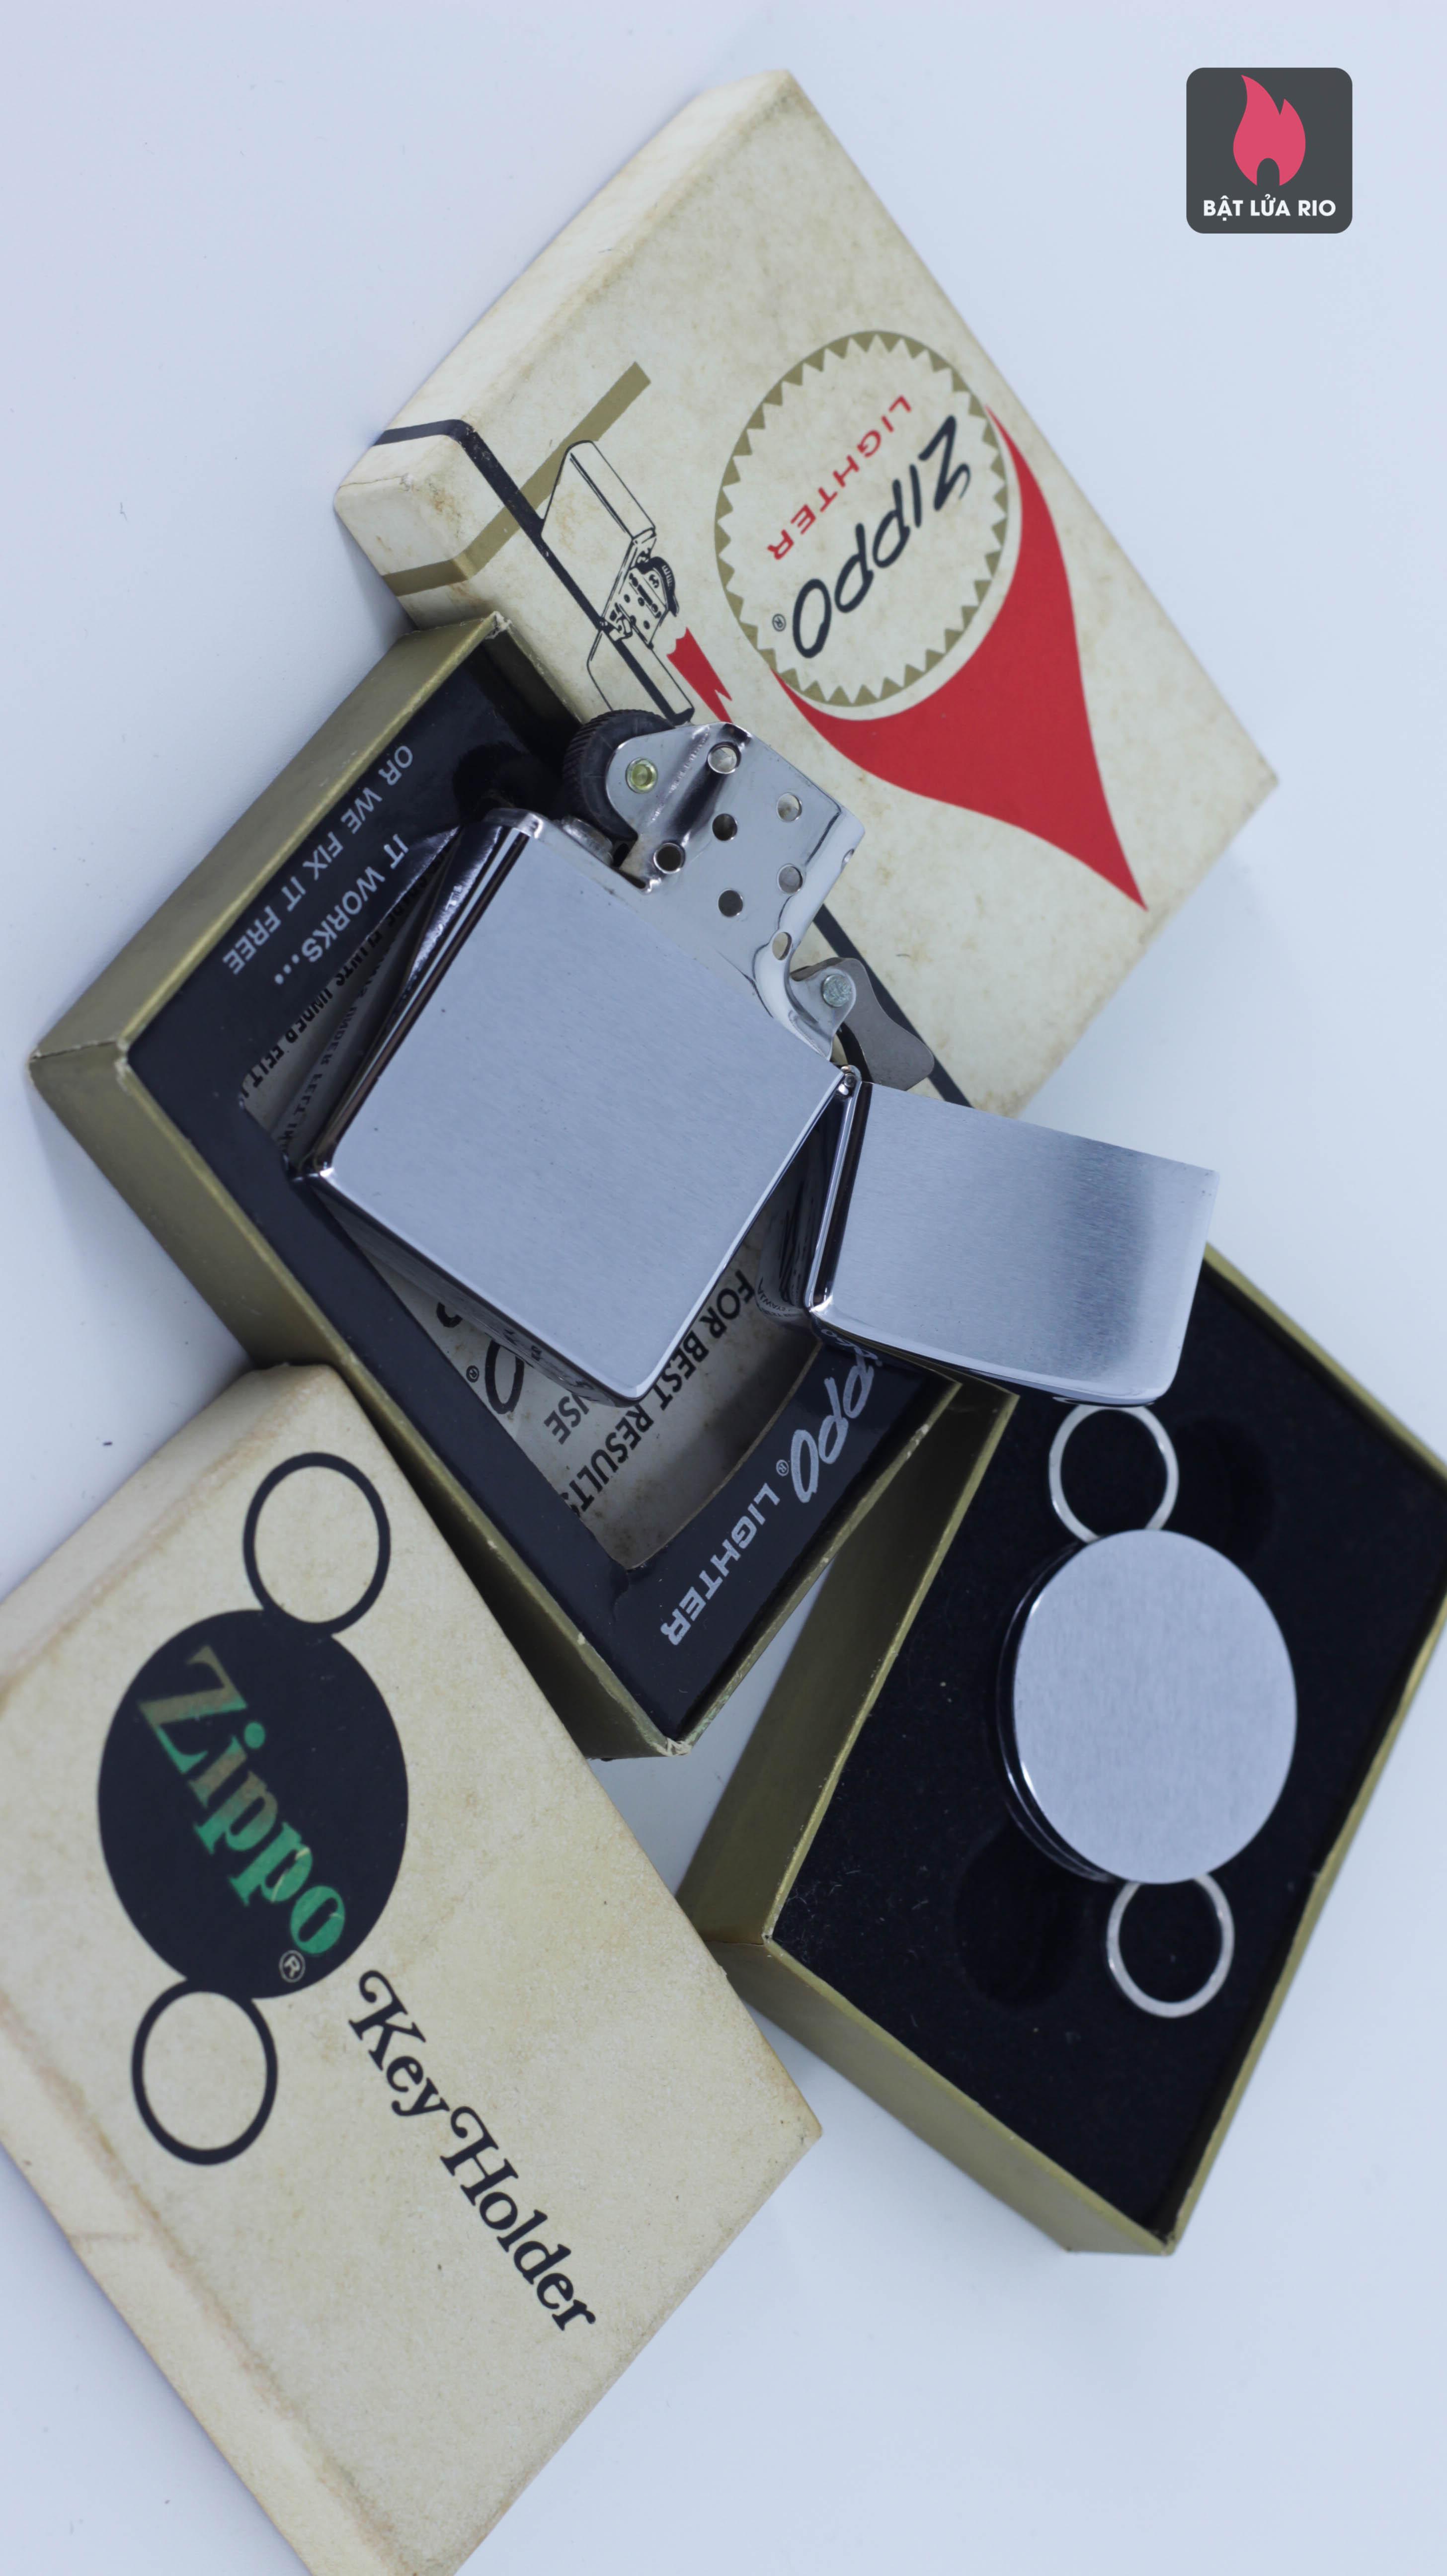 ZIPPO GIFT 1972 – SOLITRON DEVICES INC